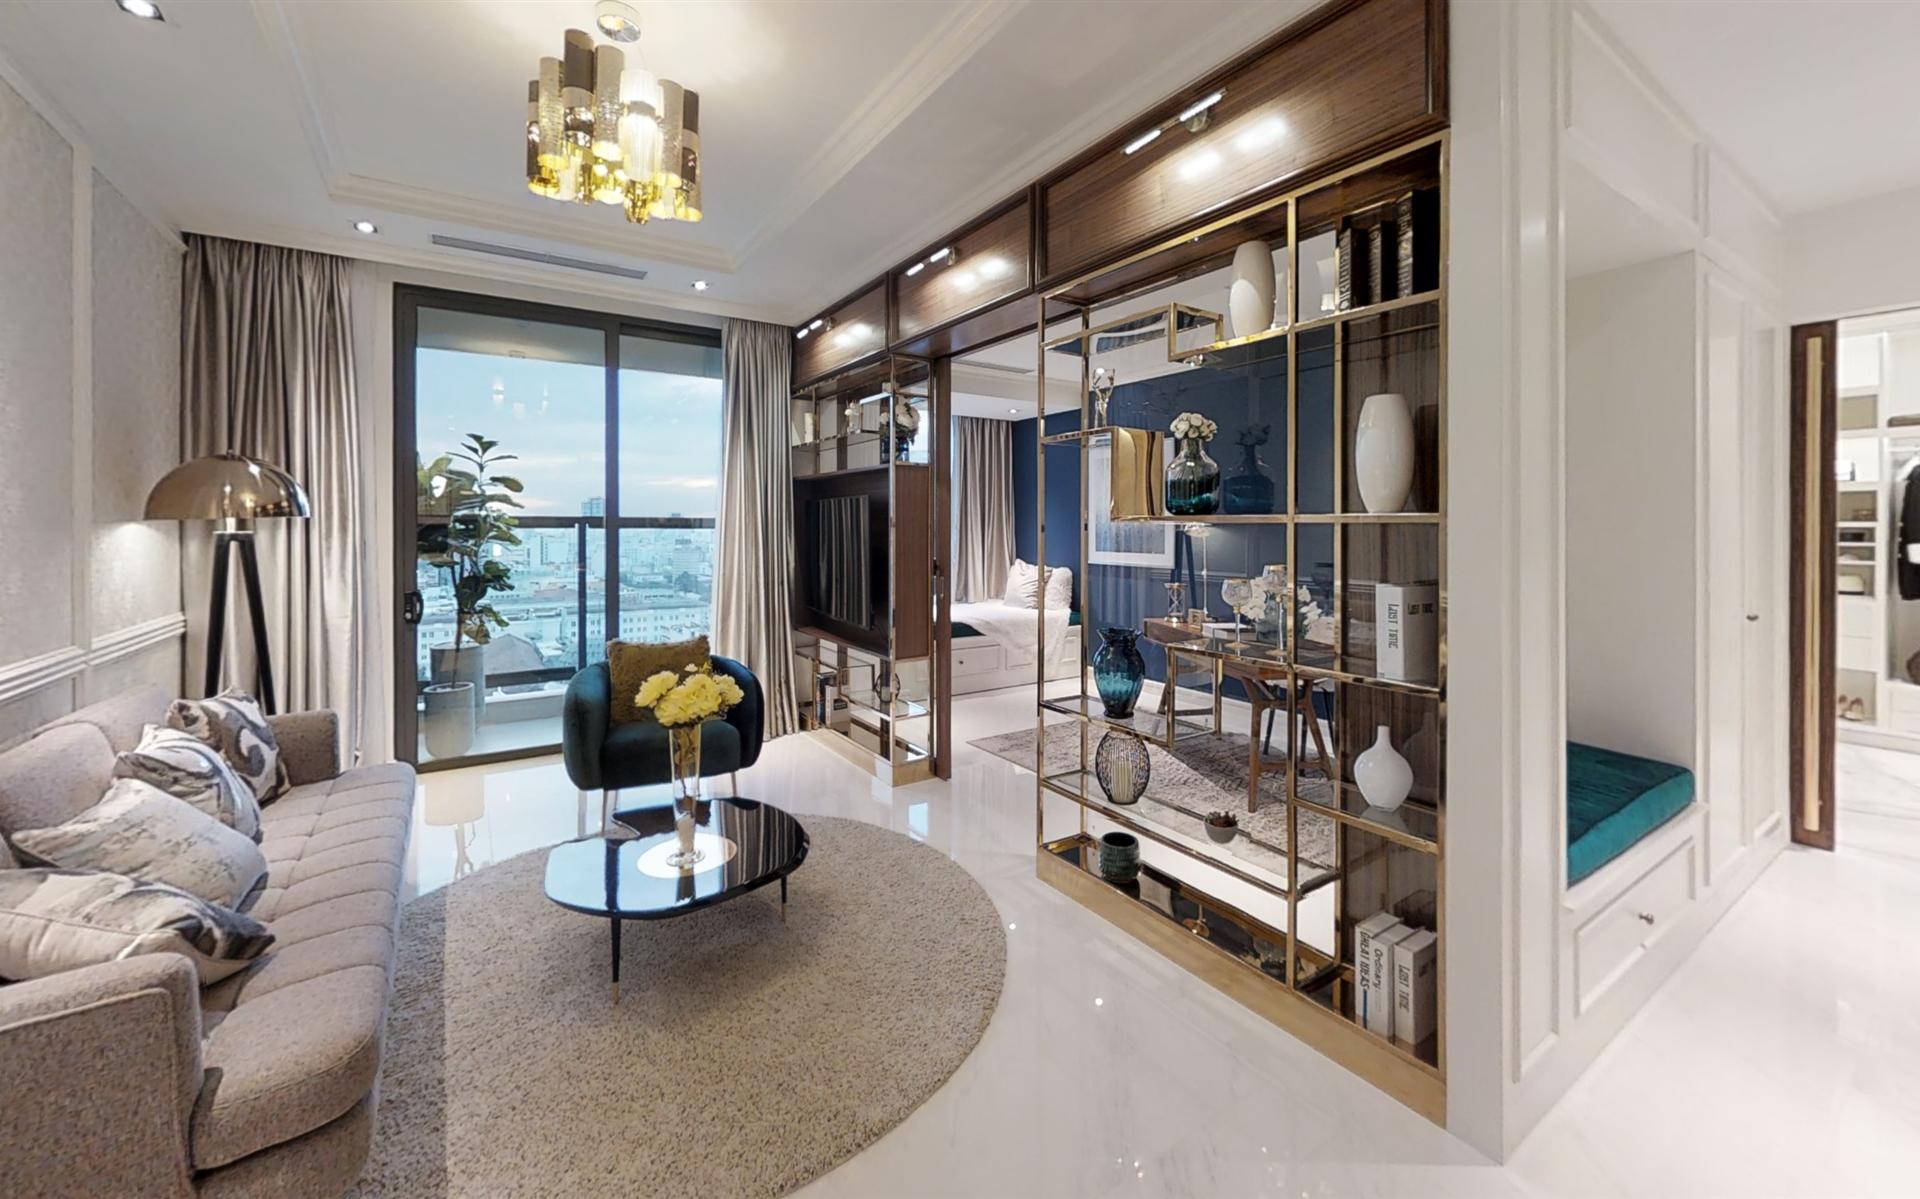 Thiết kế kiến trúc nội thất